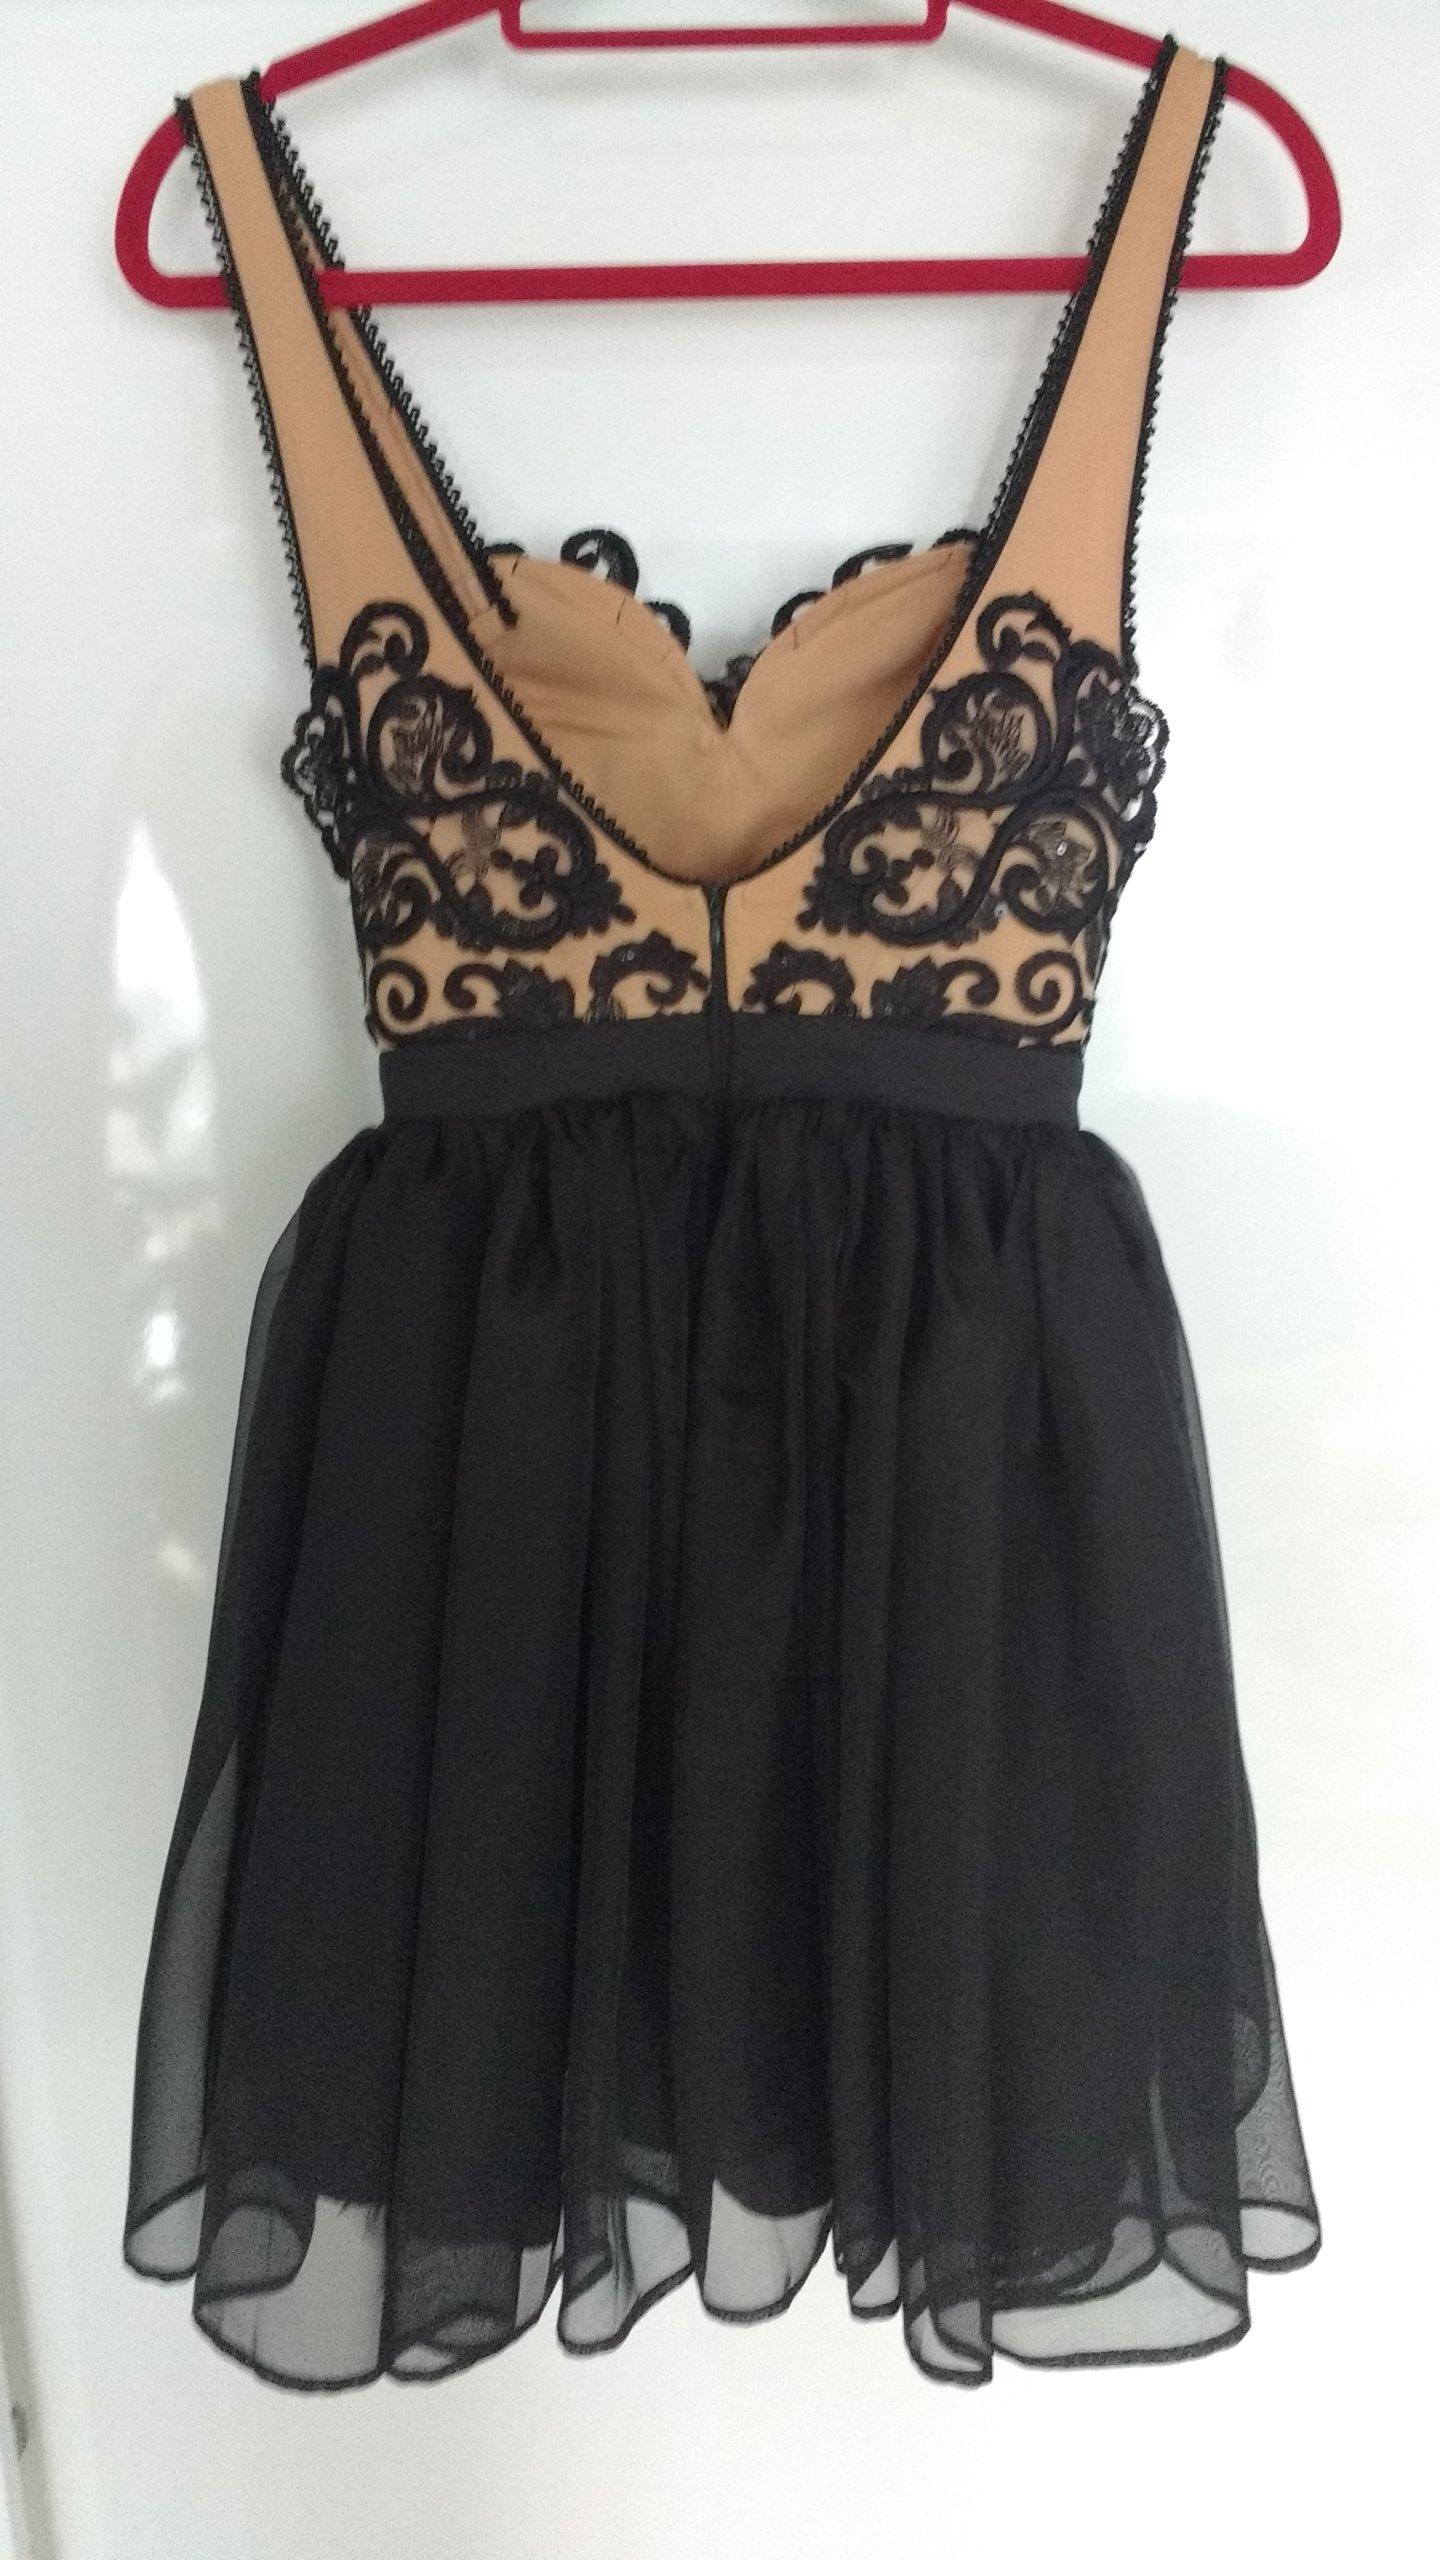 5c5b8db37d Koktajlowa sukienka Lou Karen r 34 - 7147754027 - oficjalne archiwum ...